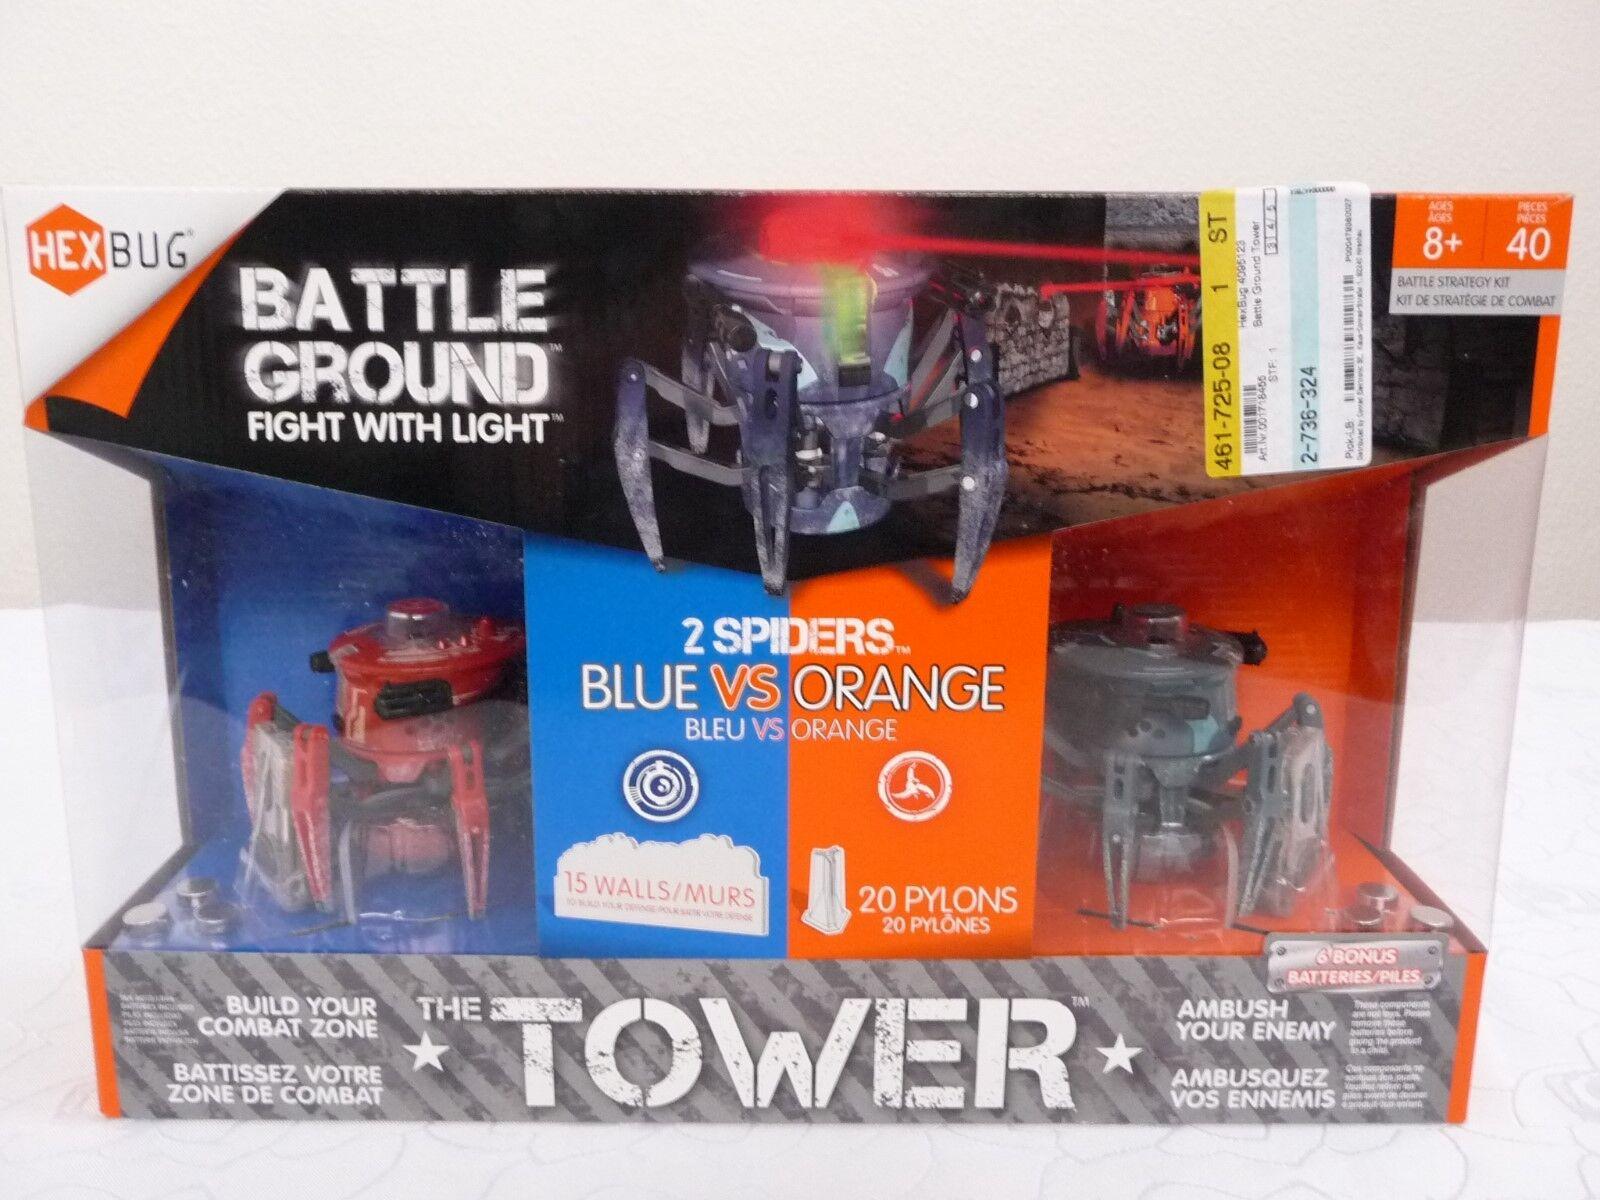 HEXBUG HEXBUG HEXBUG Battle Spider Battle Ground 5179364 NEU f64789